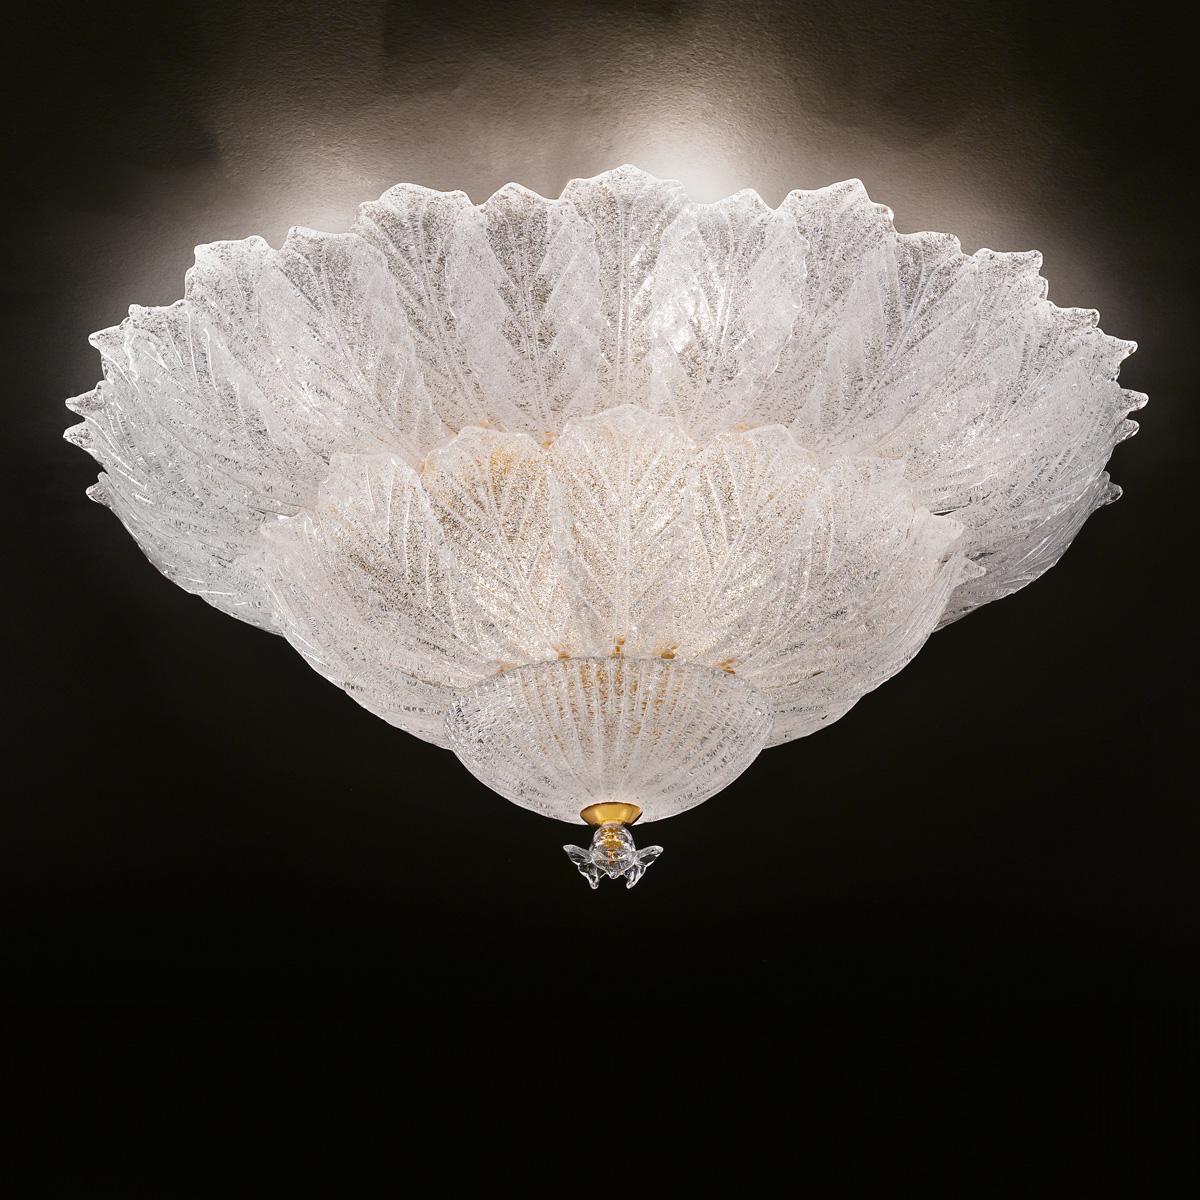 """Osanna"" plafonnier en verre de Murano - 12 lumières - ""rugiada"" transparent"